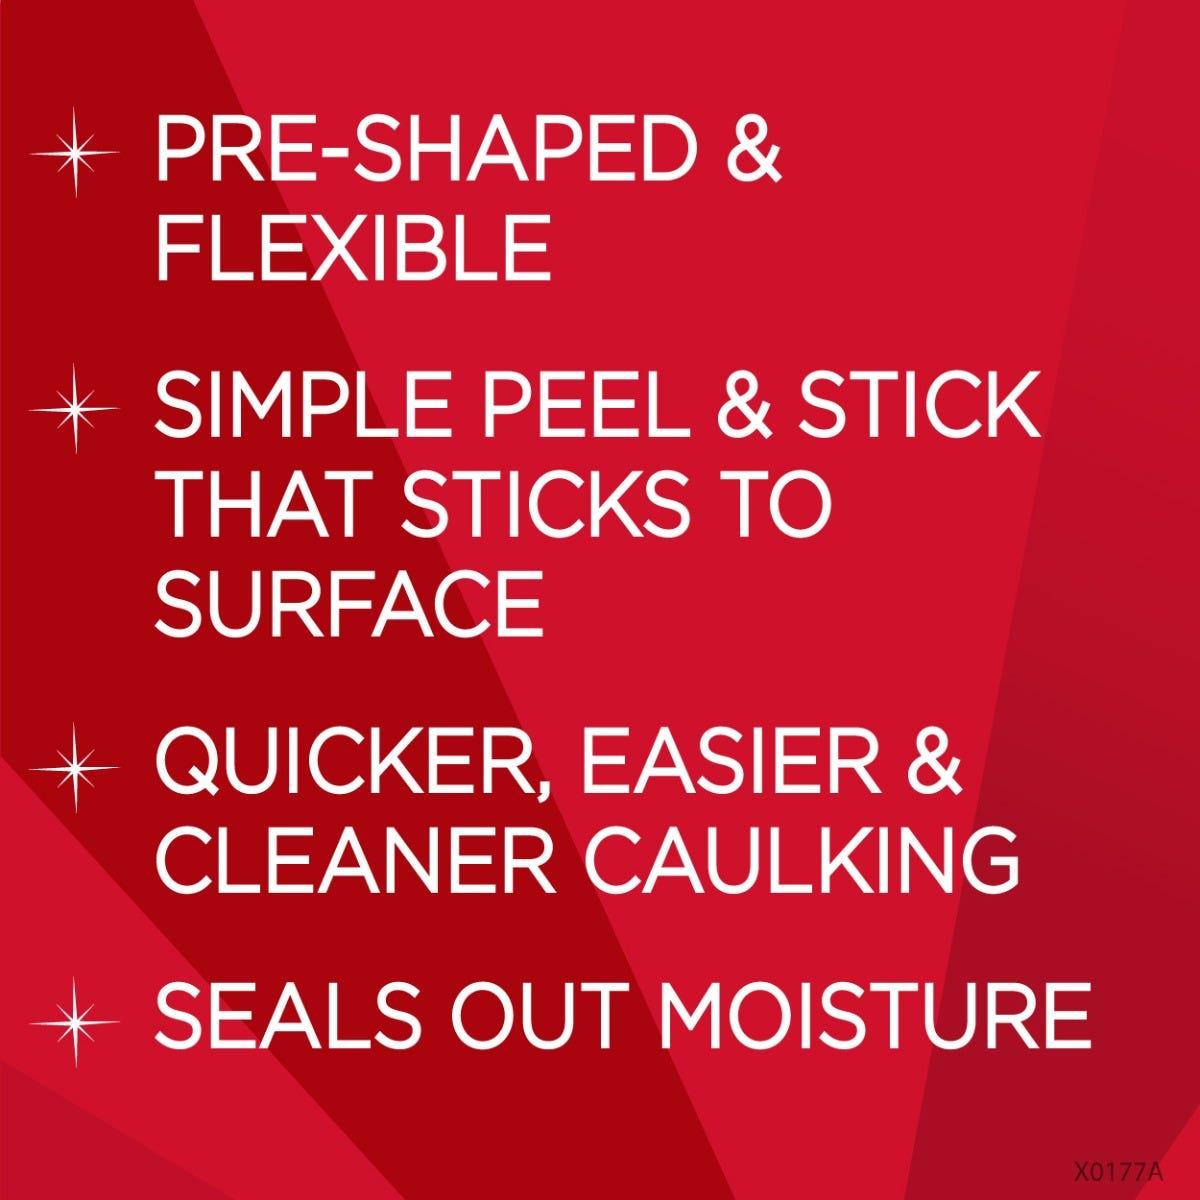 Peel & Stick Caulk benefits